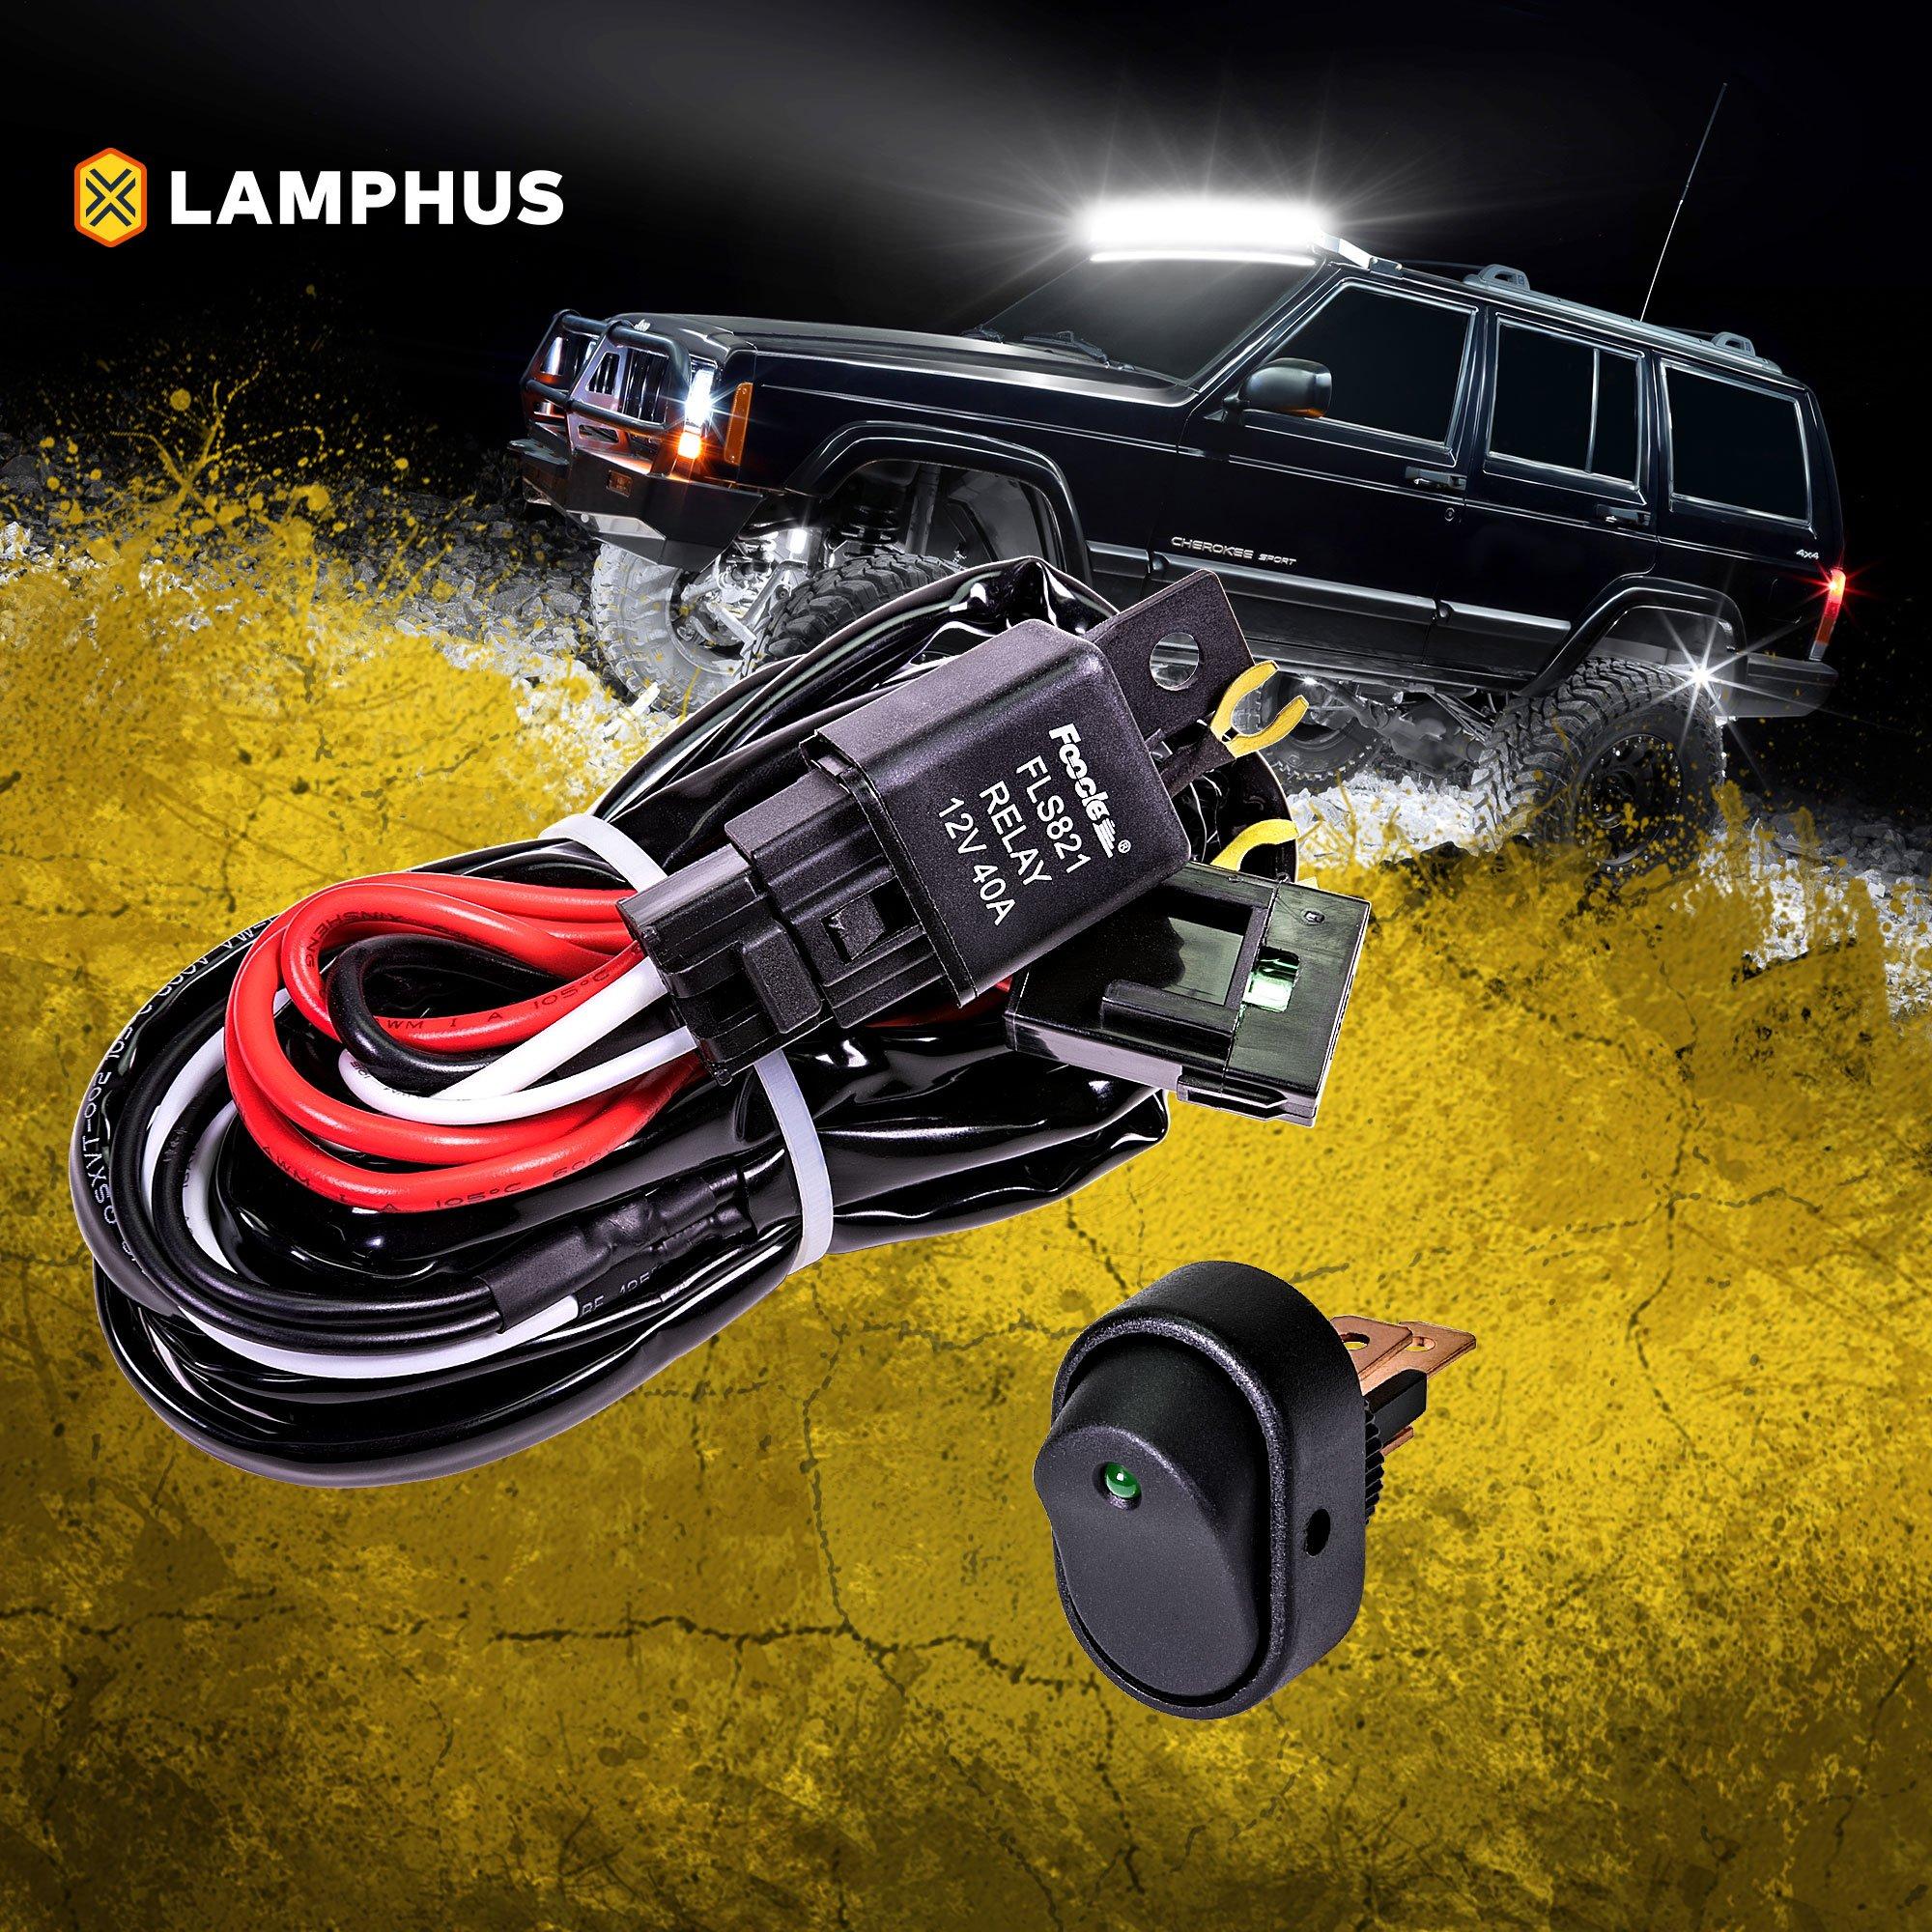 amazon.com: lamphus 12v 40a off road led light bar relay wiring harness kit  for atv - green mini on/off switch: automotive  amazon.com